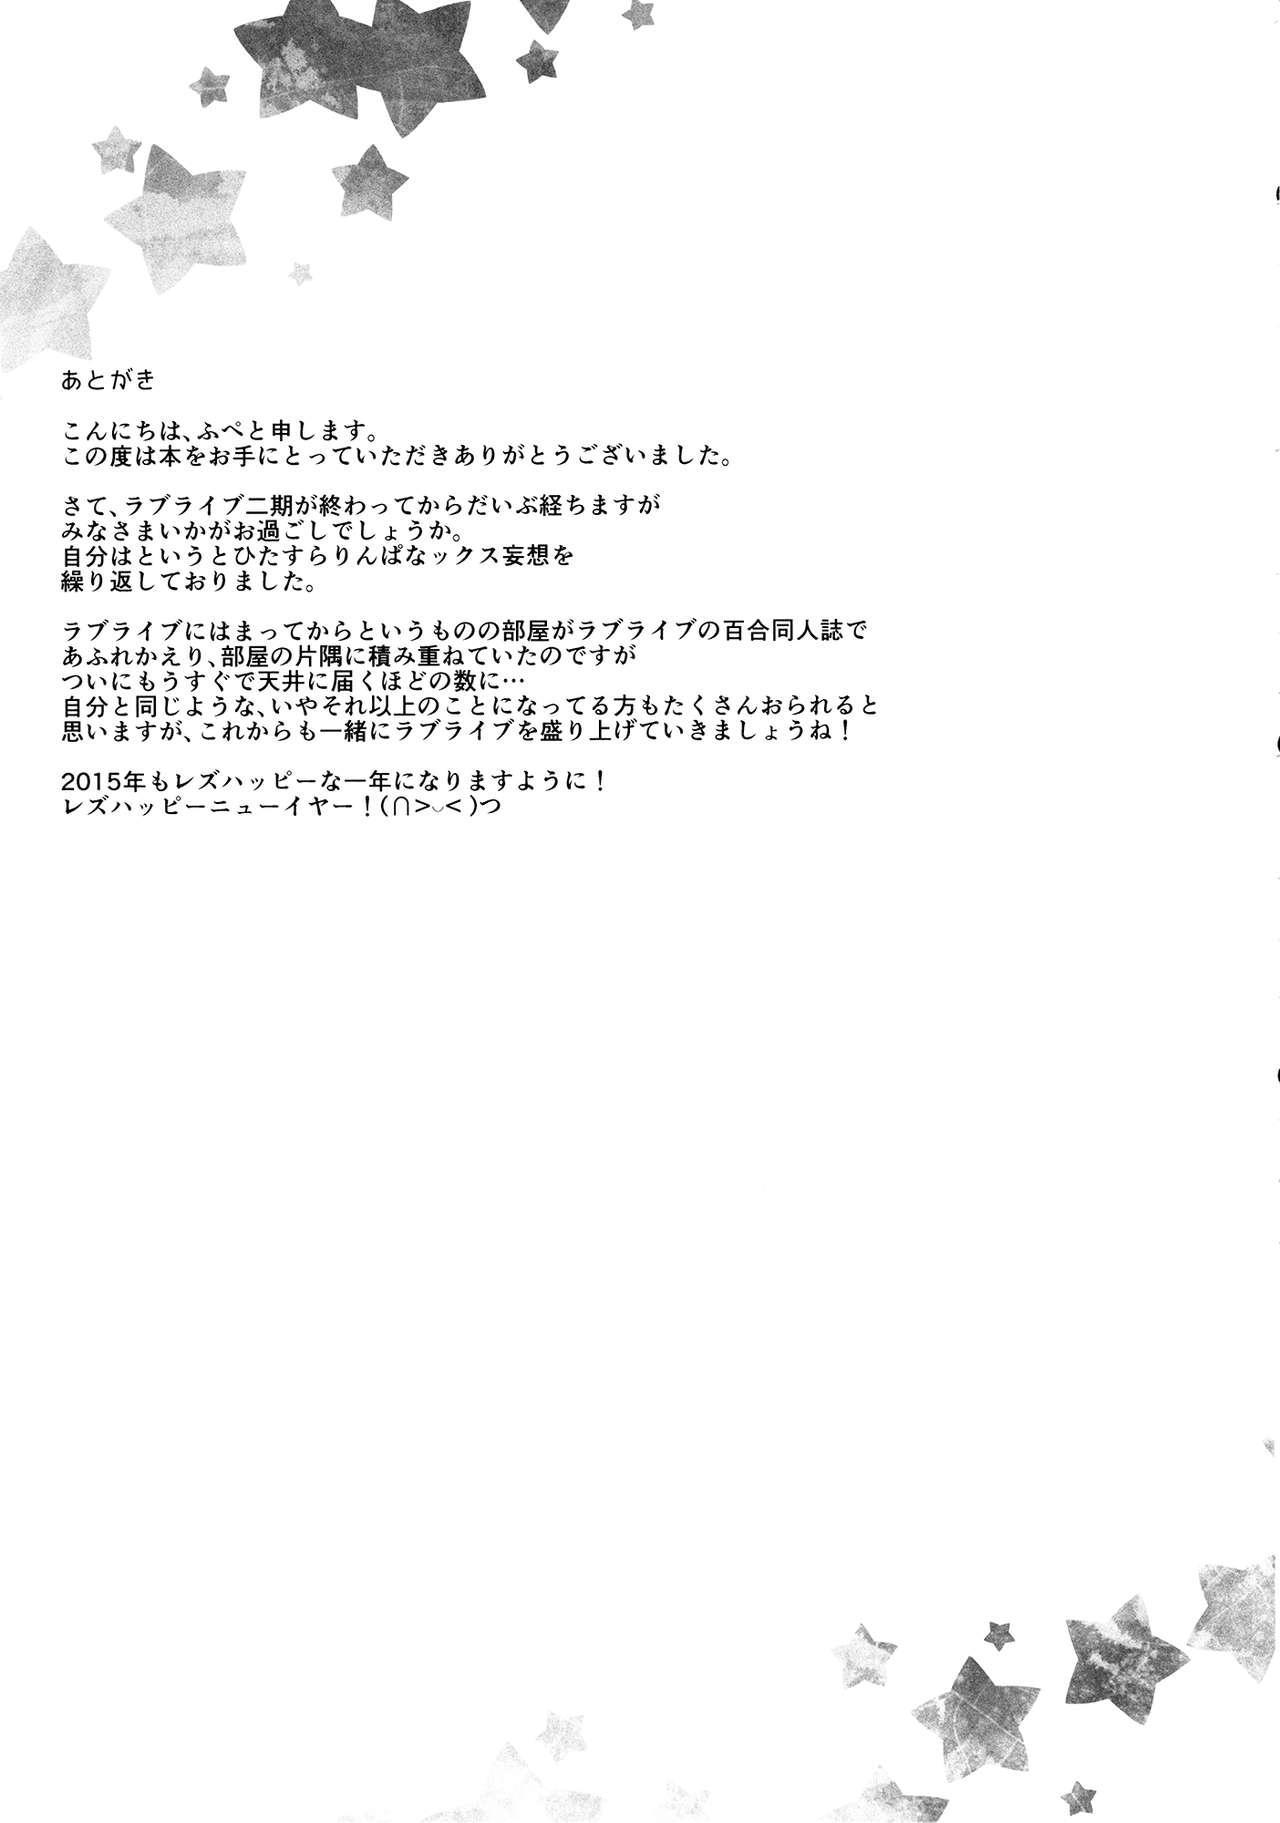 Tsuki ni Kazaseba | Holding You On The Moon 27